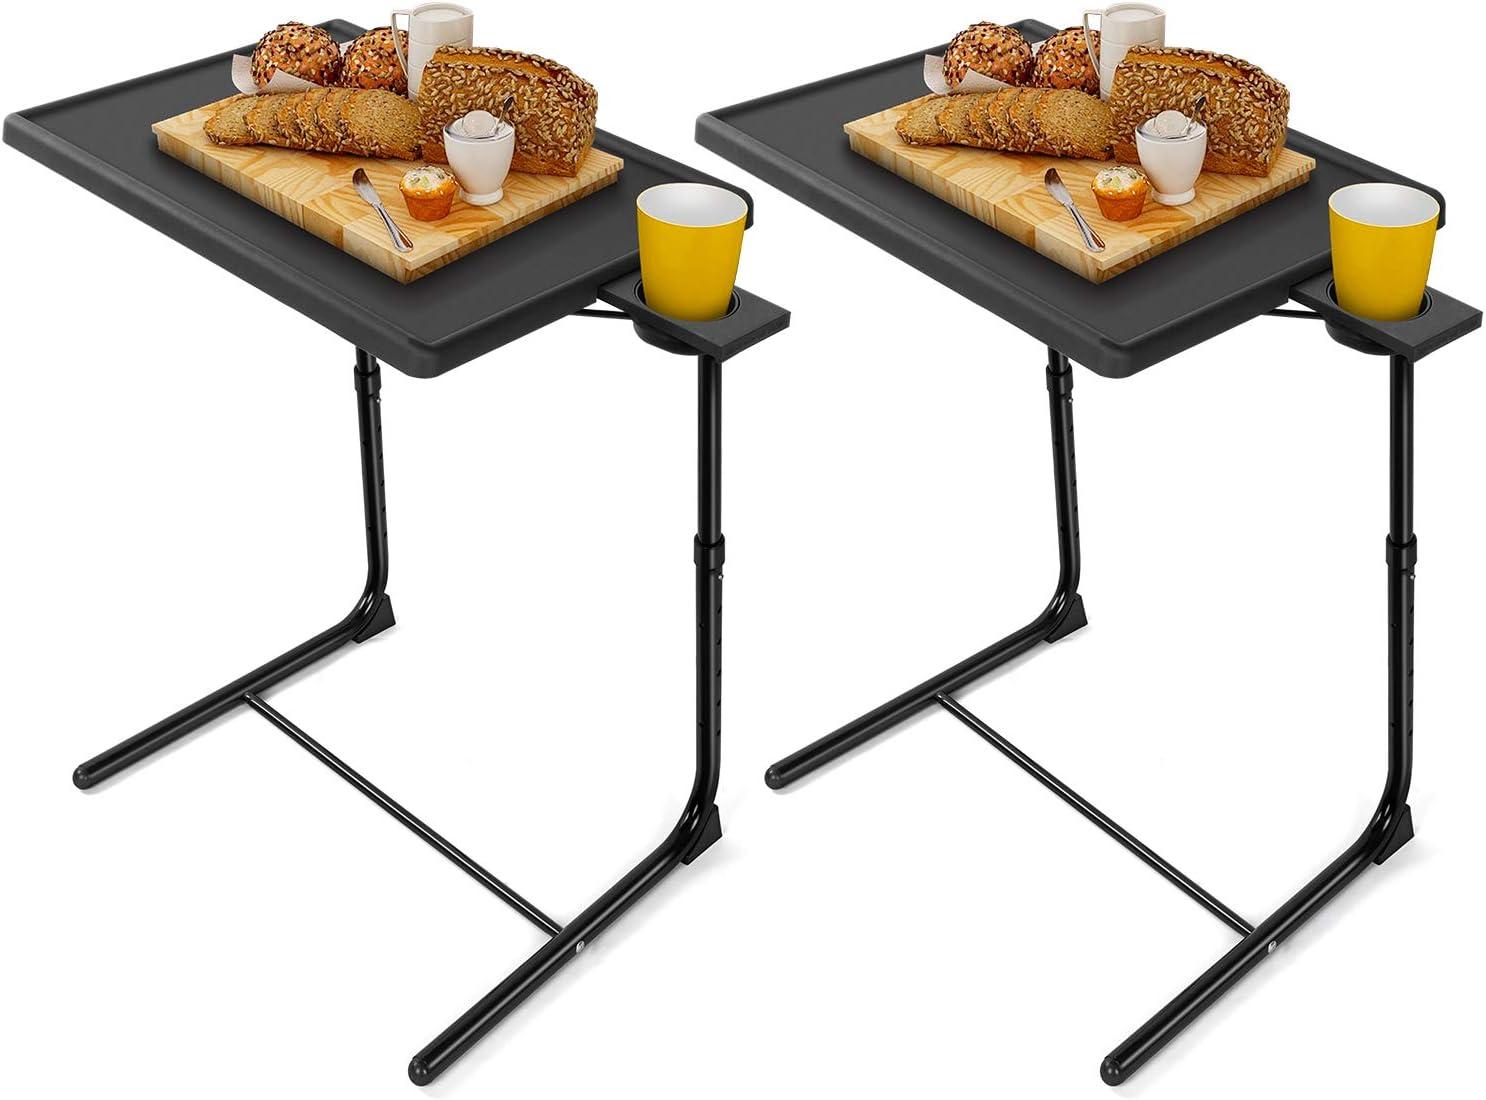 LORYERGO TV Tray Popular overseas discount Table - Packs 2 Dinner Tab Adjustable